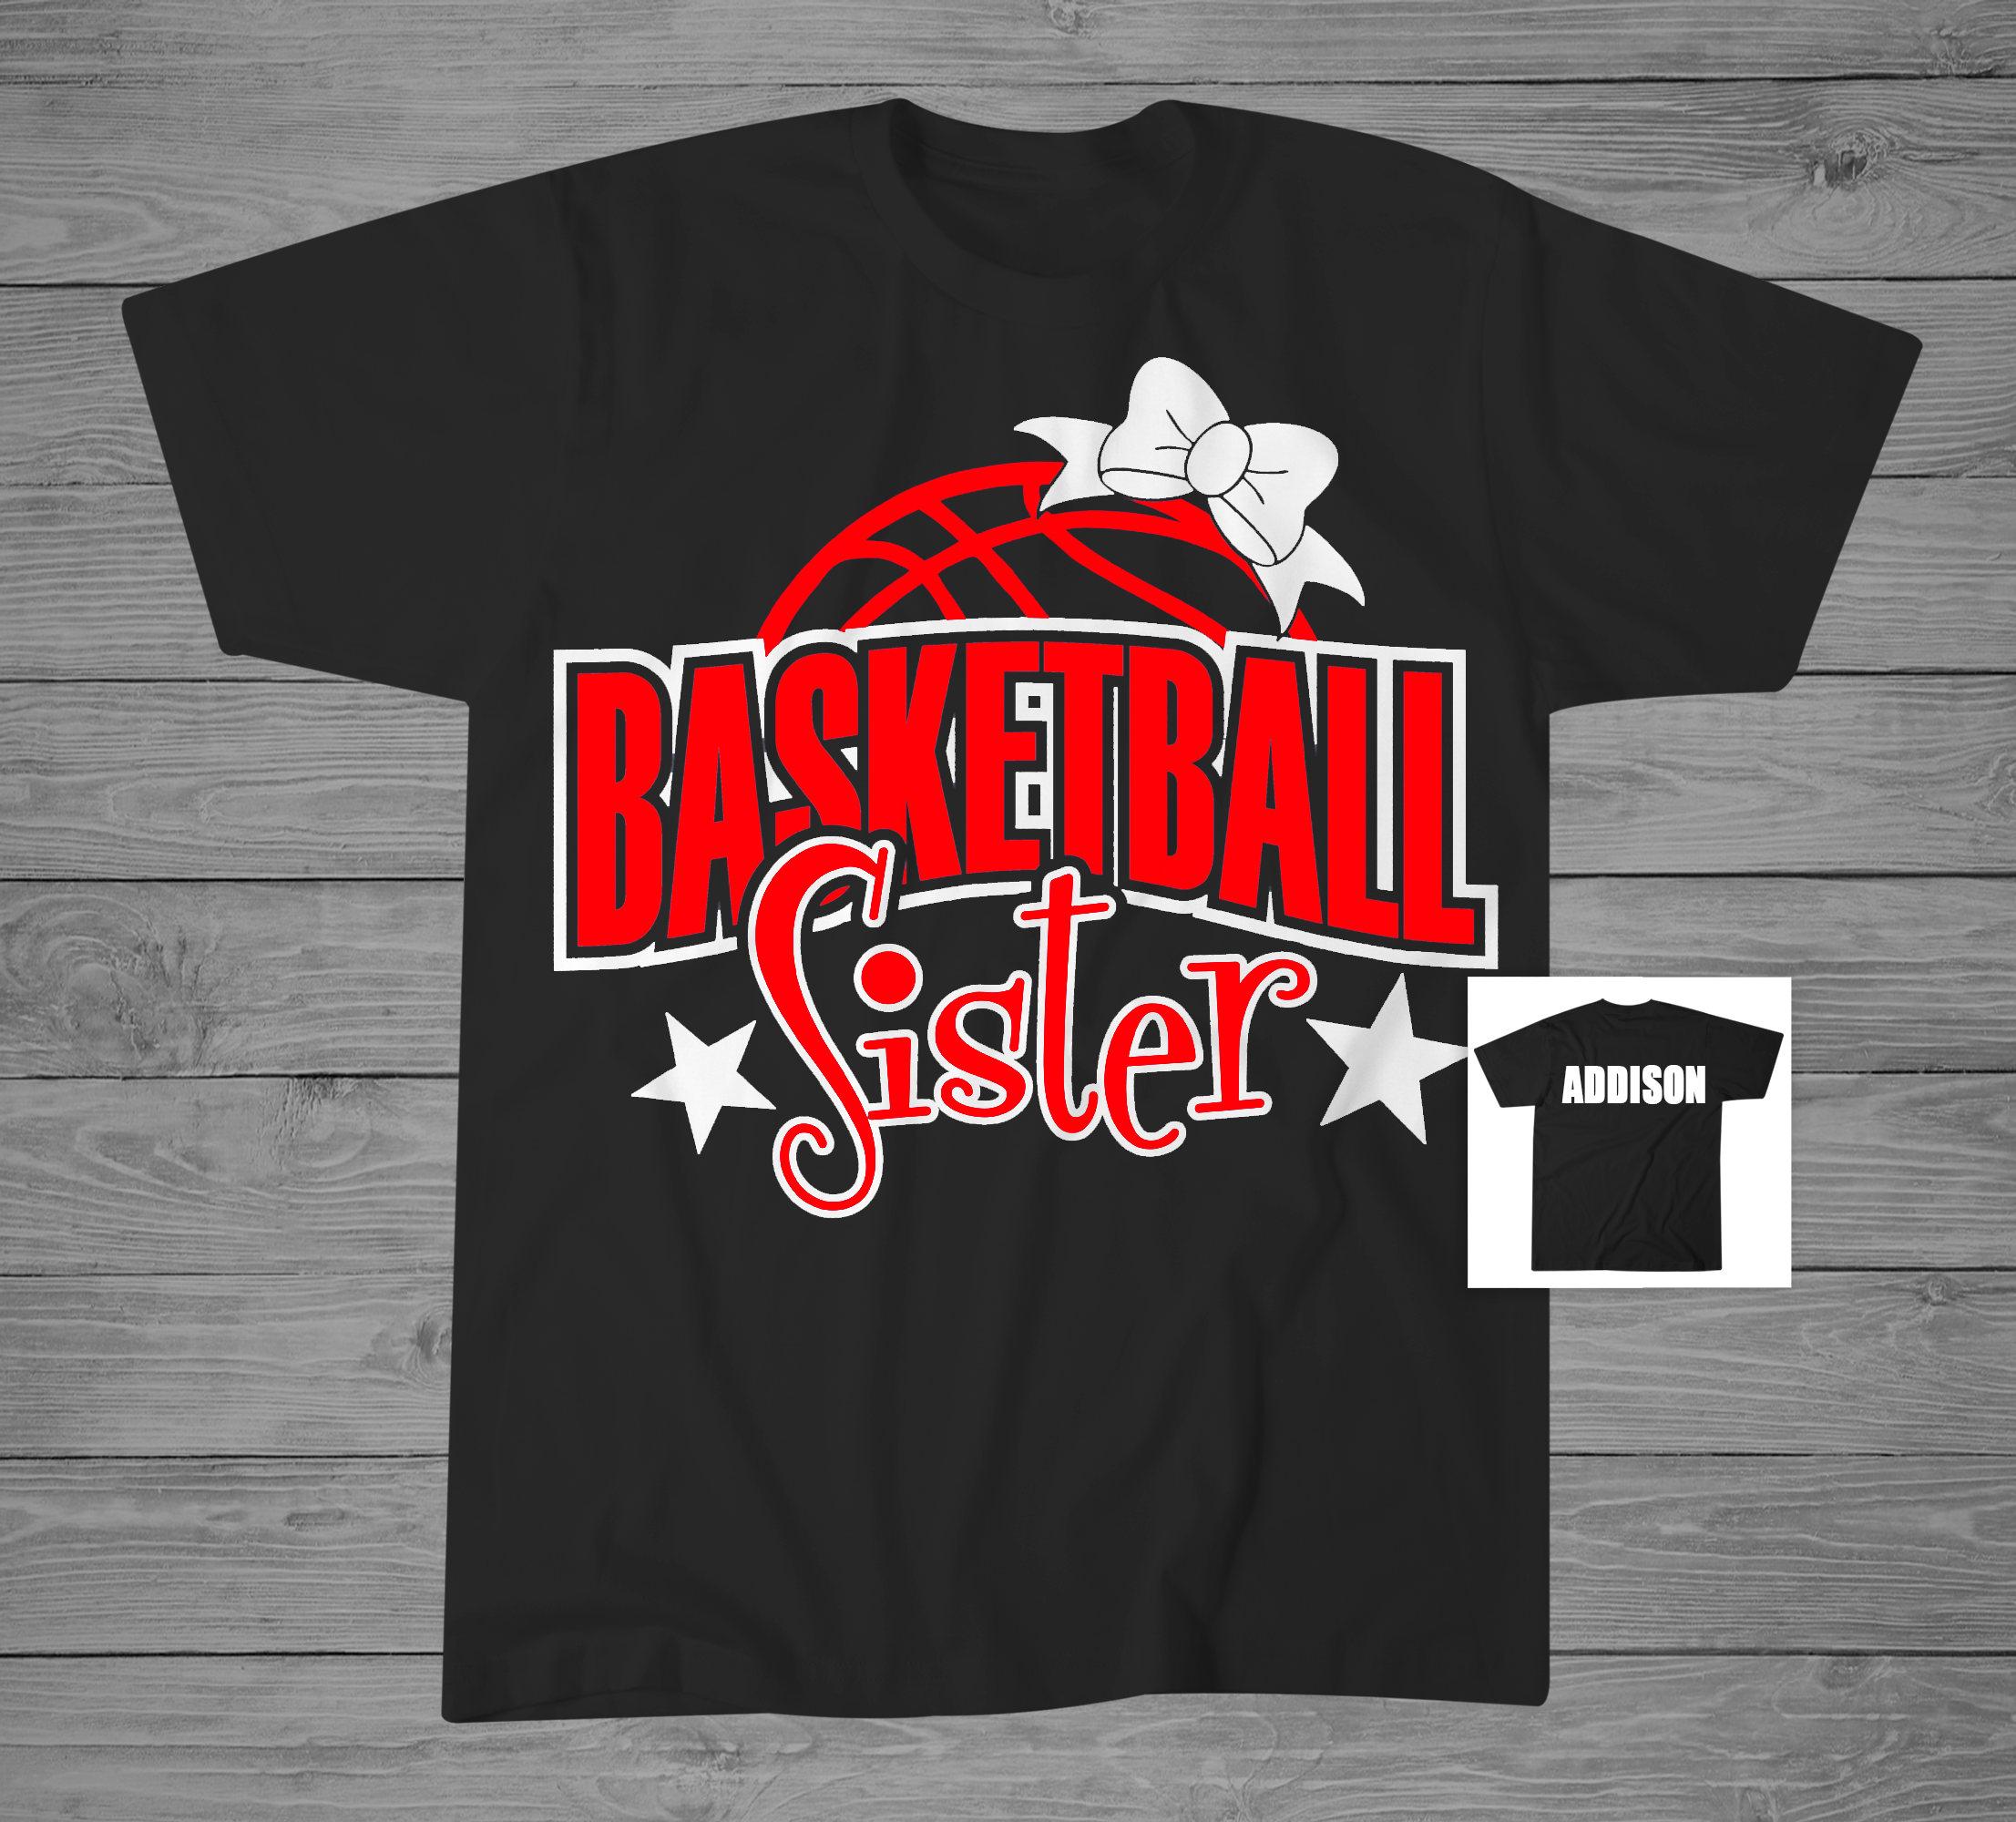 basketball sister t shirt proud basketball sister shirt. Black Bedroom Furniture Sets. Home Design Ideas